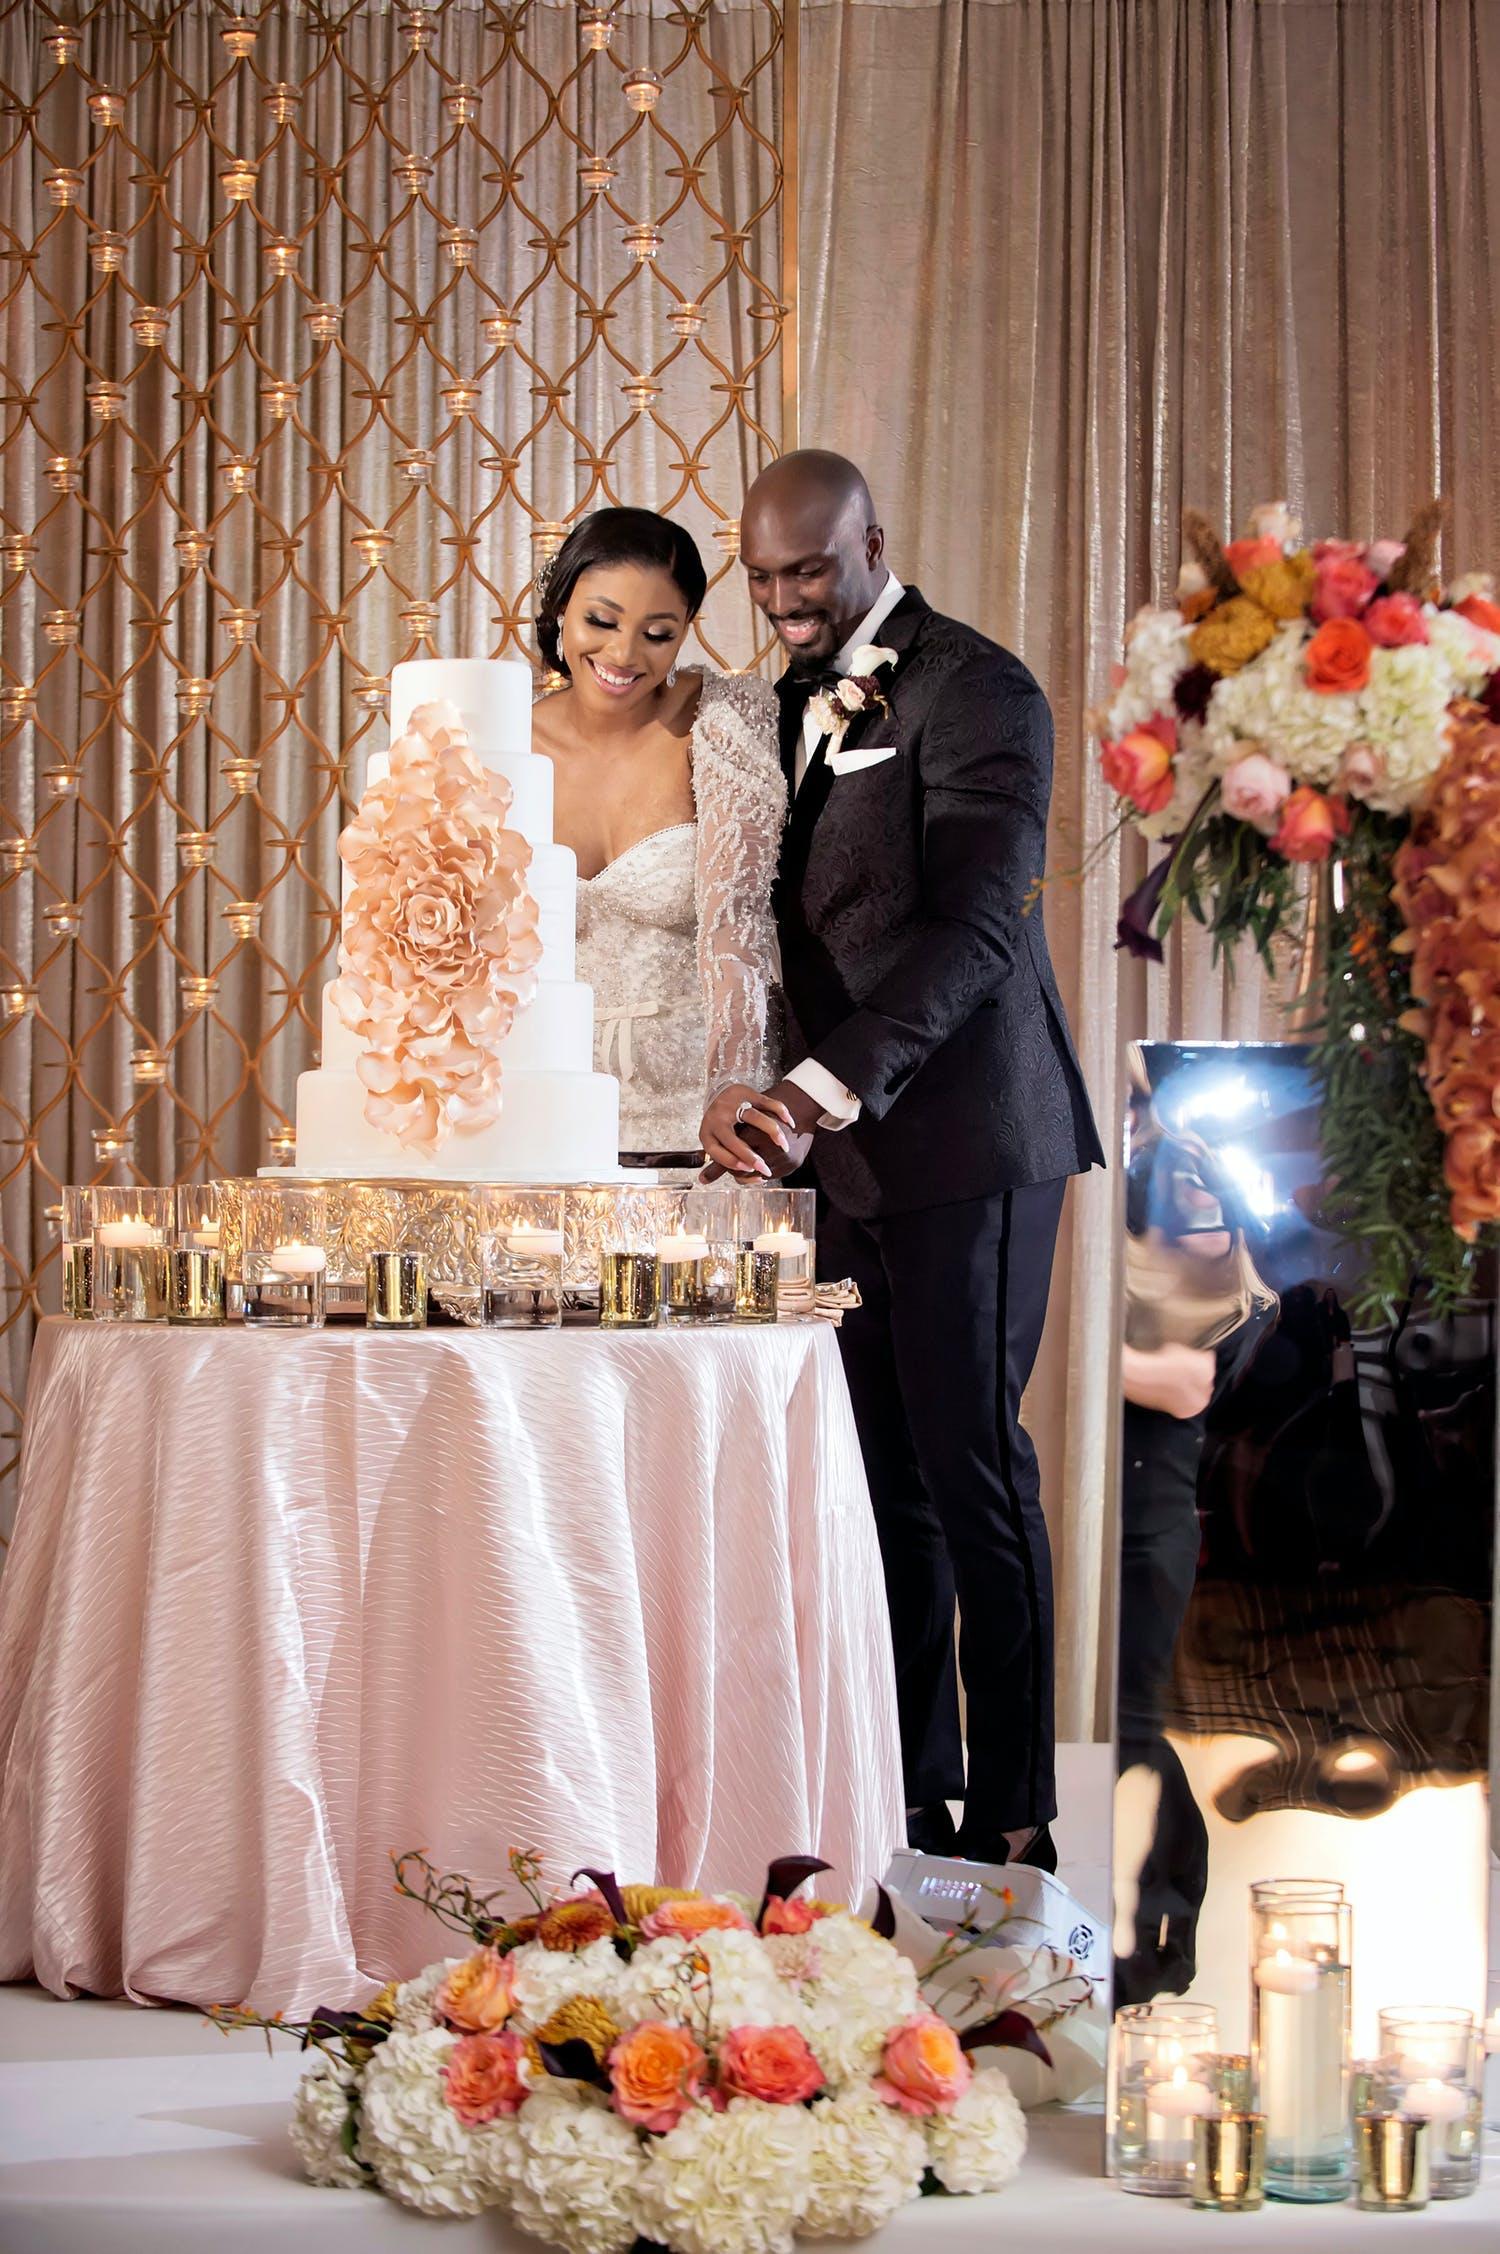 Bride and Groom Slice Cake at Glamorous Pink-Hued Wedding Reception at The Ritz-Carlton Atlanta   PartySlate